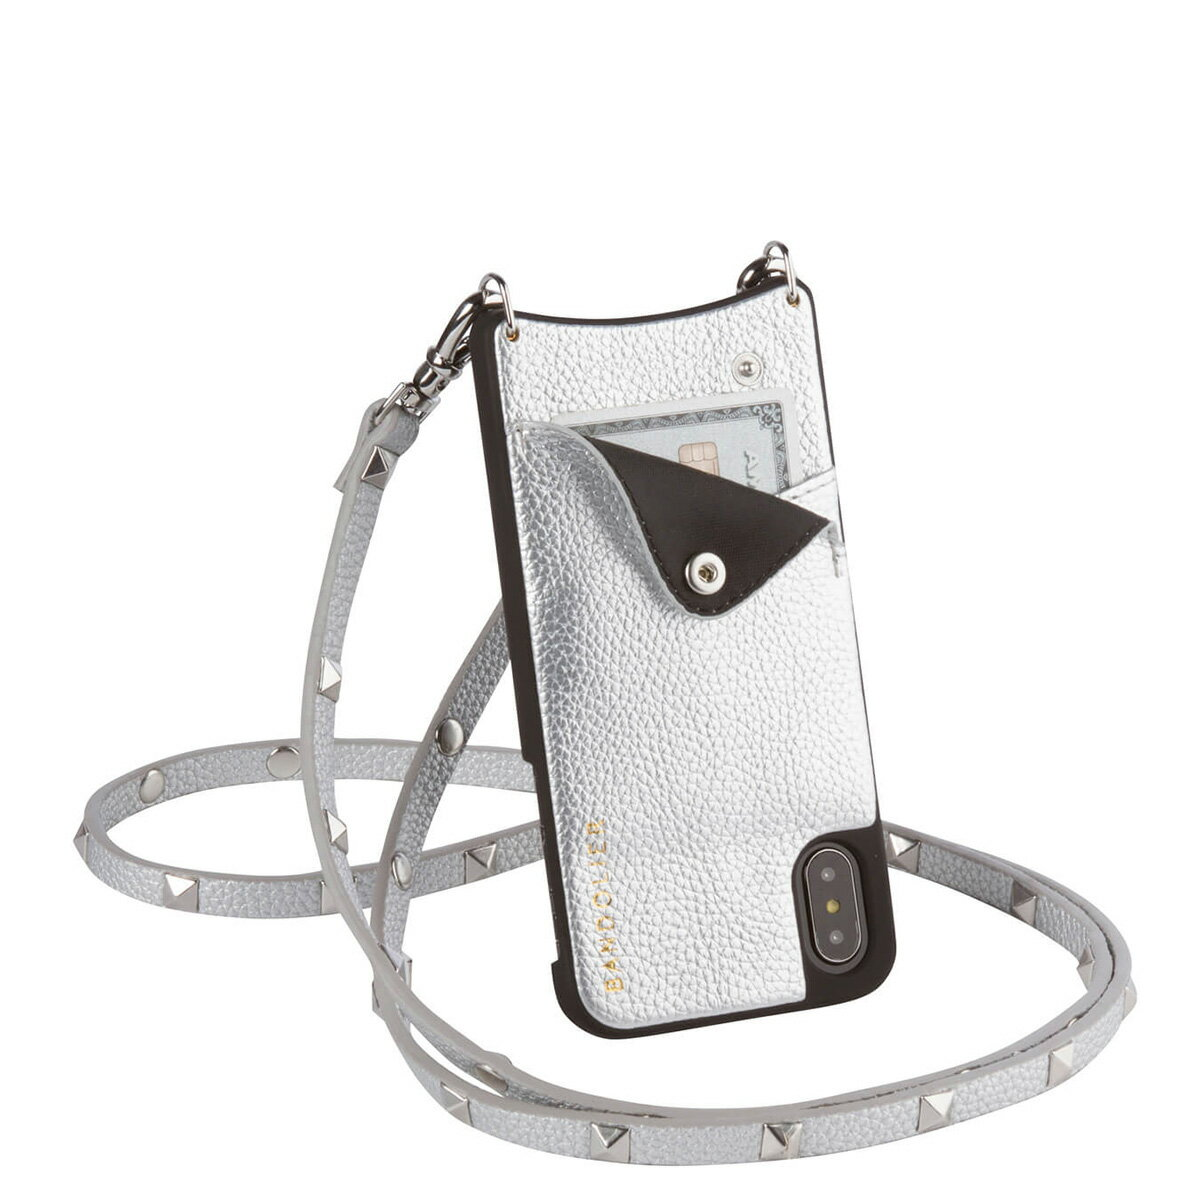 BANDOLIER SARAH RICH SILVER バンドリヤー iPhoneXS X ケース スマホ アイフォン メンズ レディース[192]